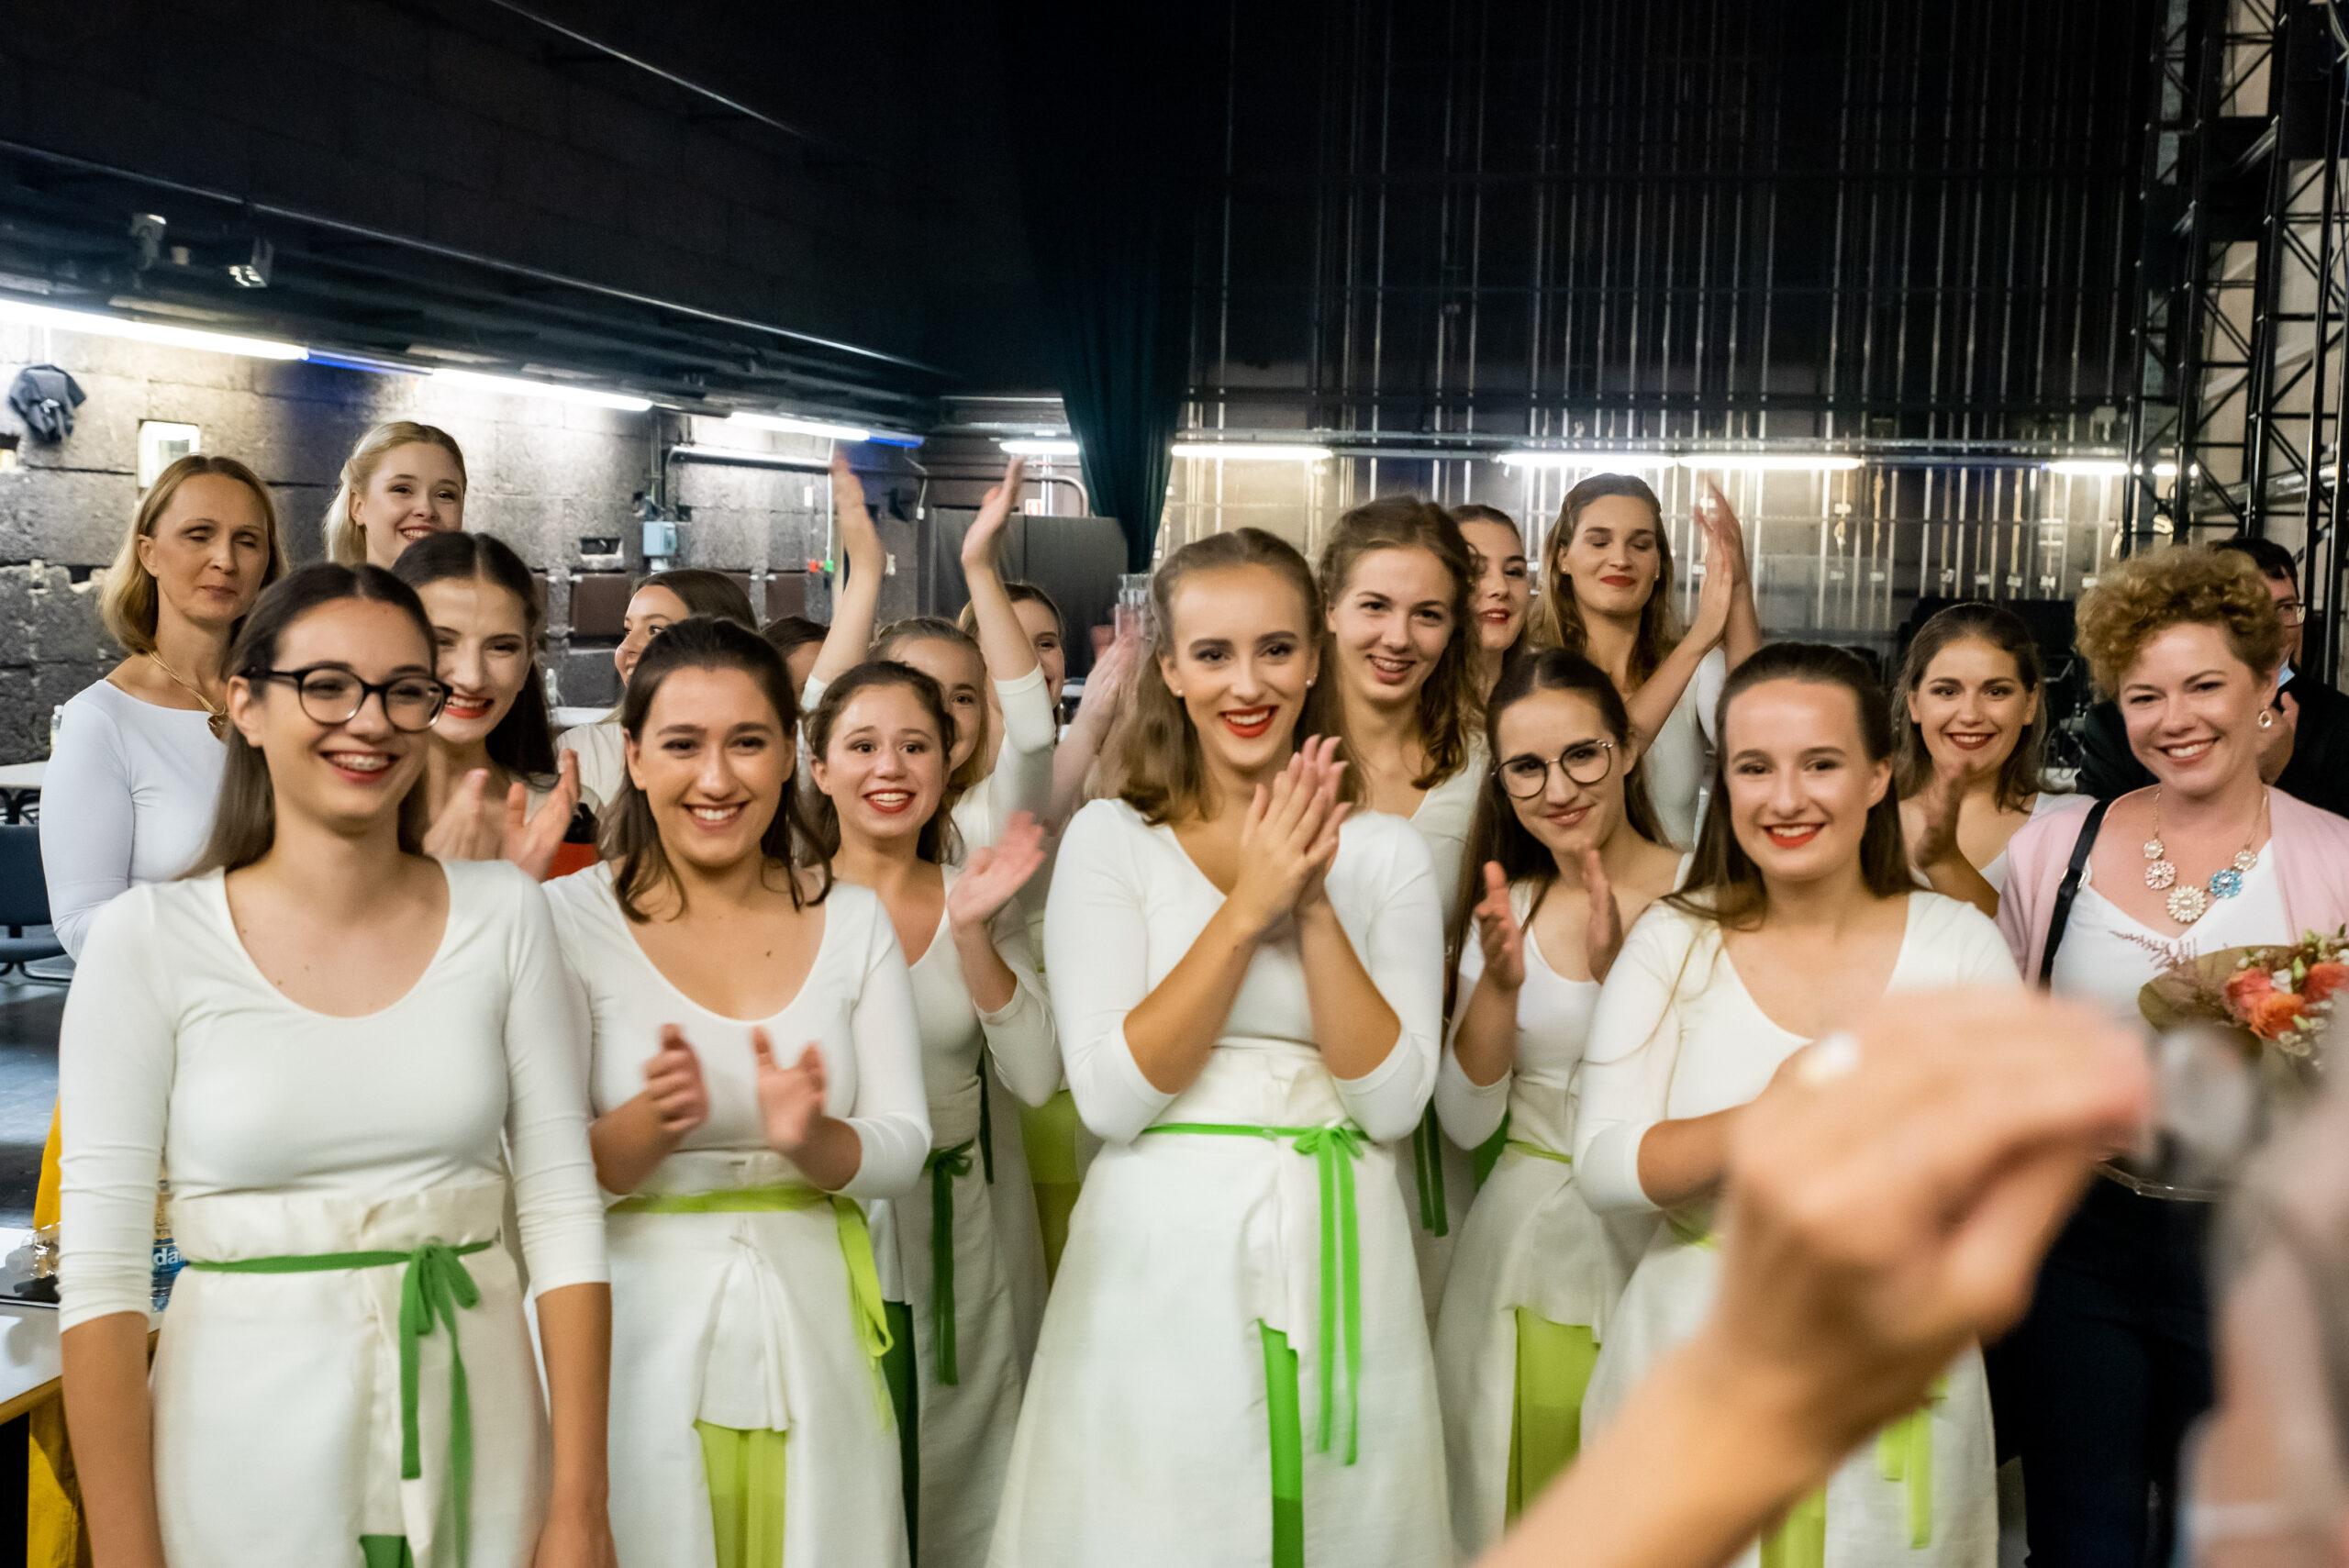 EC Ljubljana 2021, Dekliški zbor sv. Stanislava; Photo: Janez Eržen